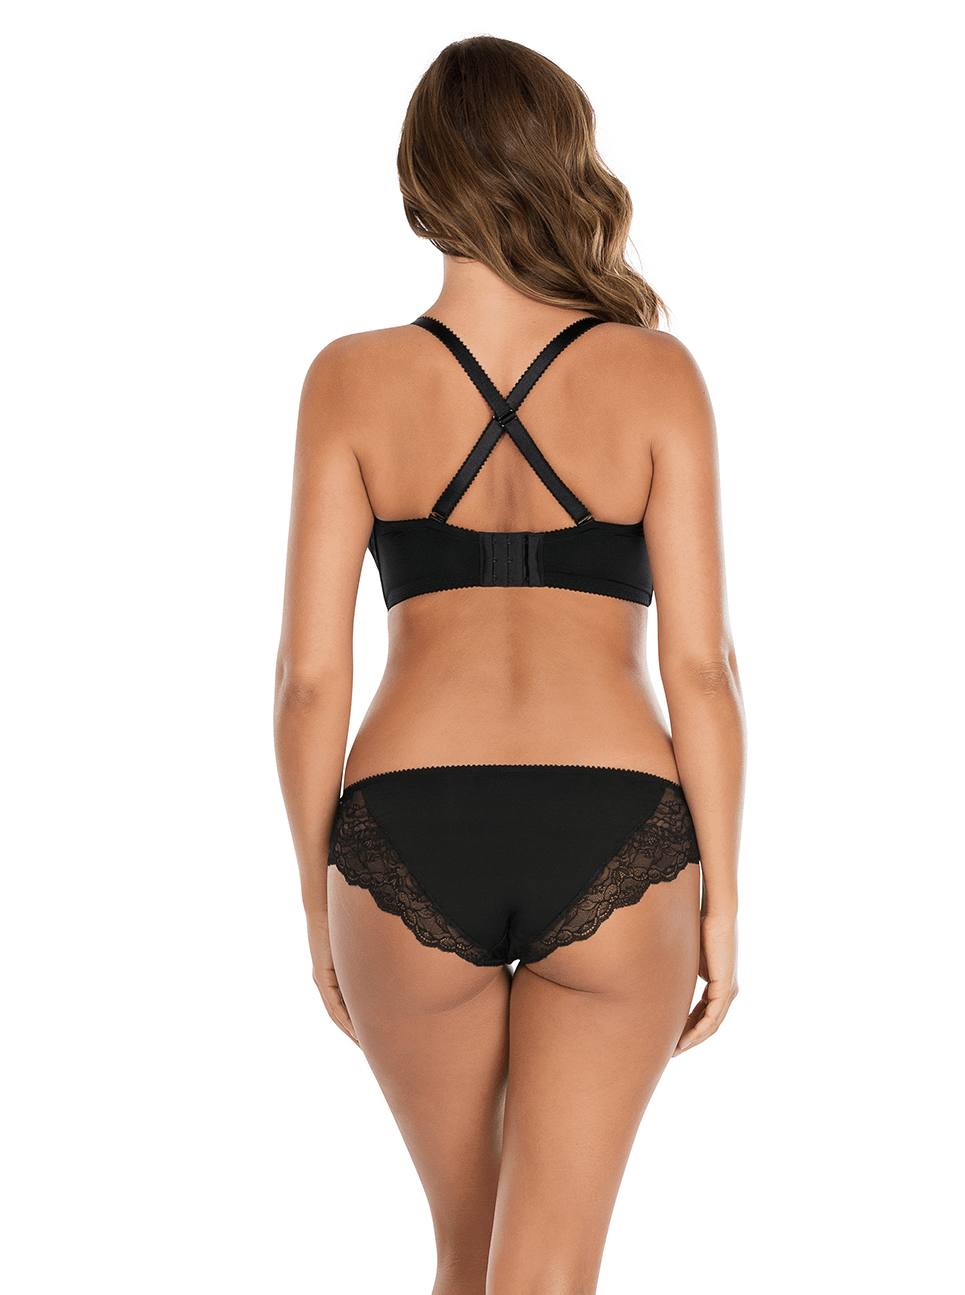 Elissa ContourUnderwireBraP5011 BikiniP5013 Black Cross Back - Elissa Strapless Bra - Black - P5011